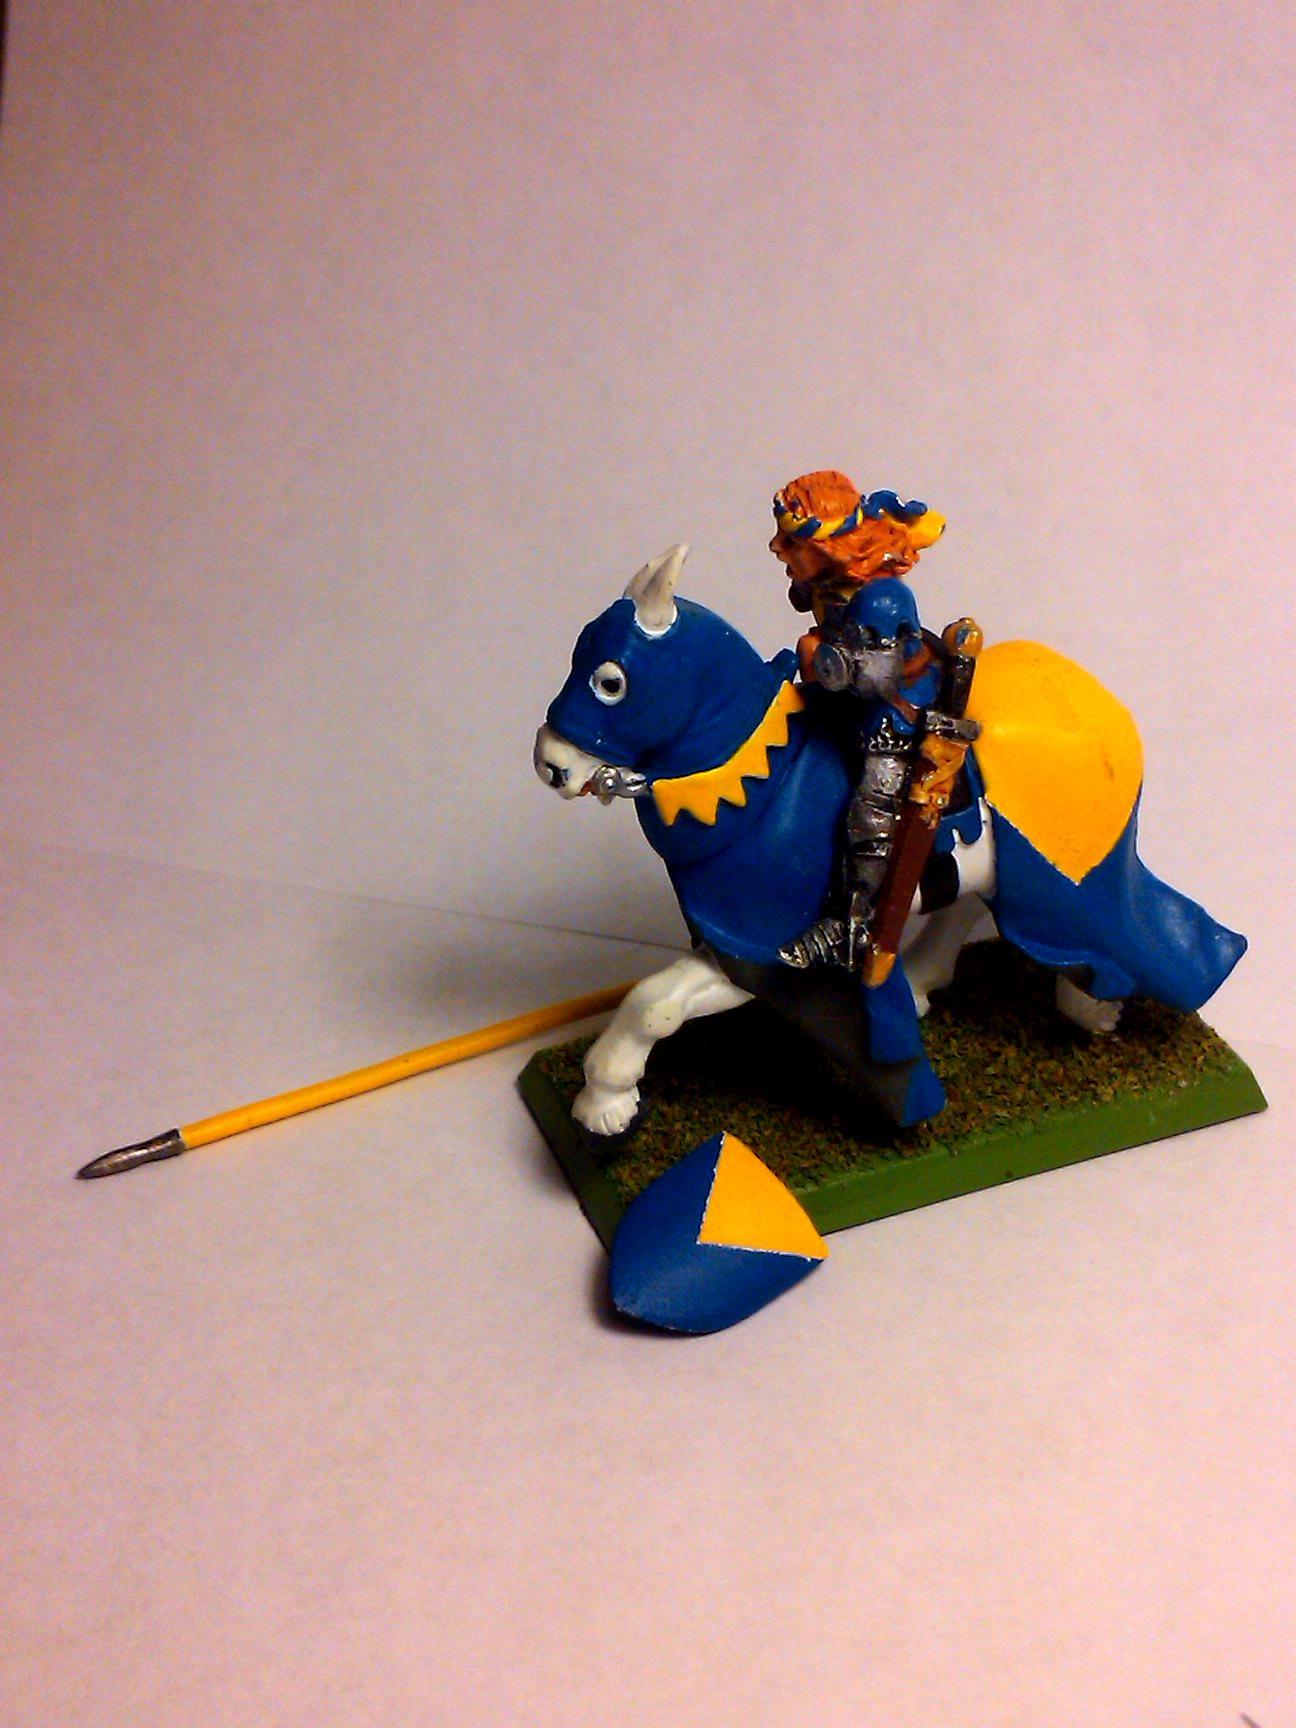 Archers, Bretonnians, Build, Grail, Hobby, Knights, Men At Arms, Painting, Peasant, Pegasus, Warhammer Fantasy, Wf